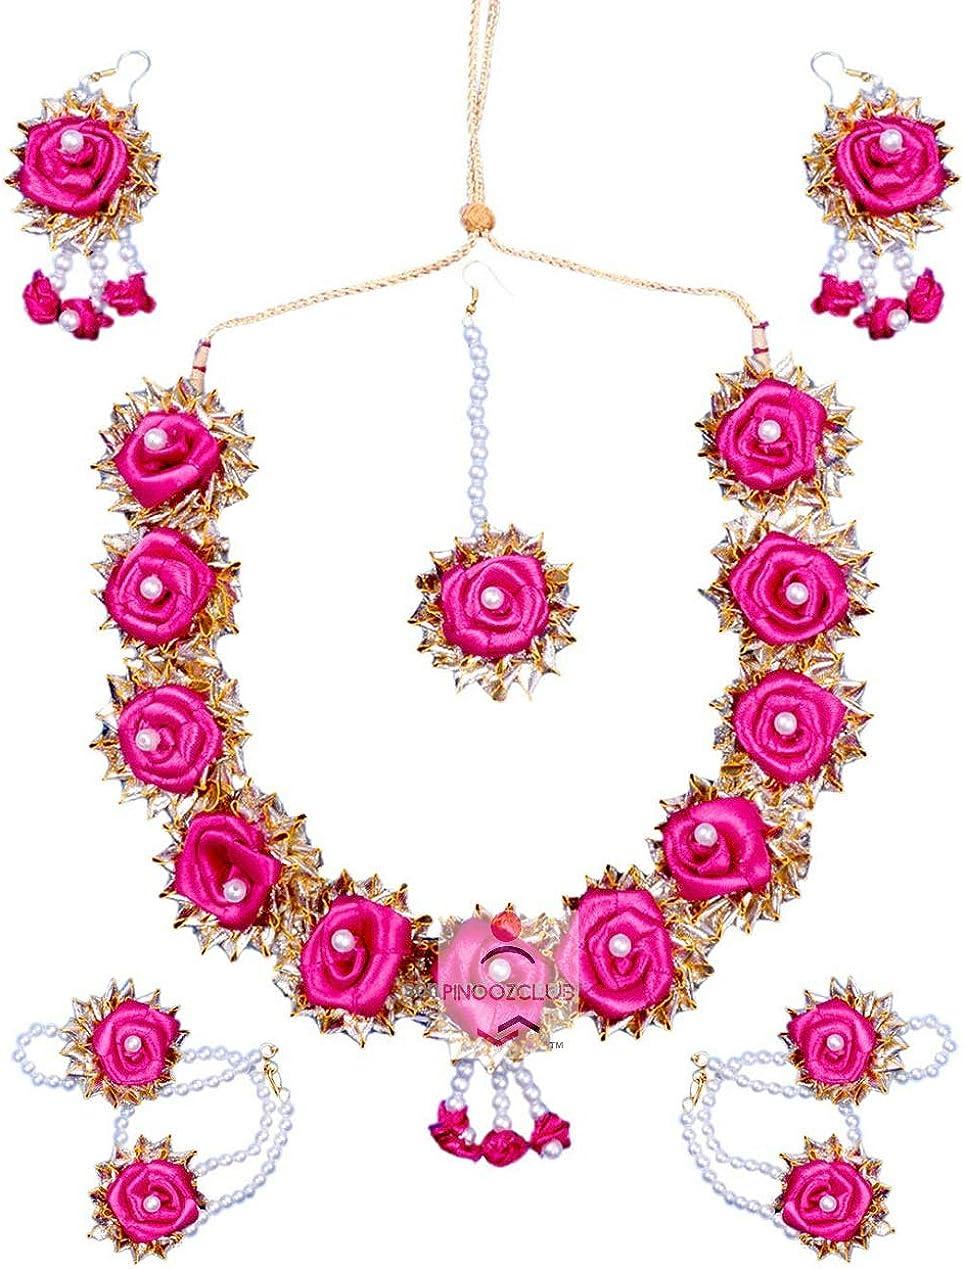 Pinoozclub Pink Satan Gota Patti Necklace/Earring/Maangtika Jewellery Set For Women/Girls